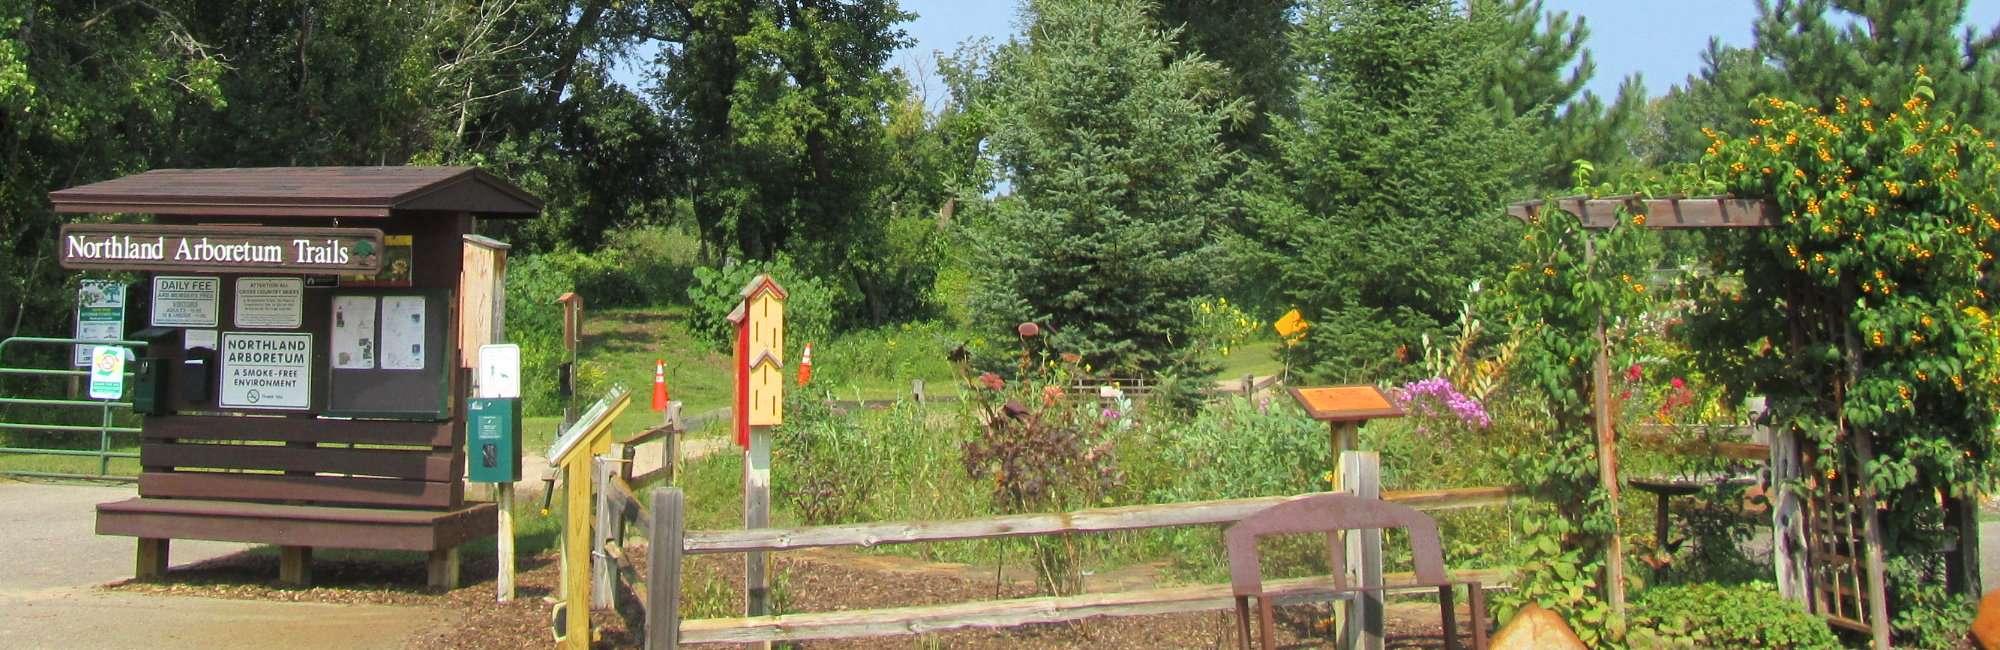 Slide-Recreation-Northland-Arboretum